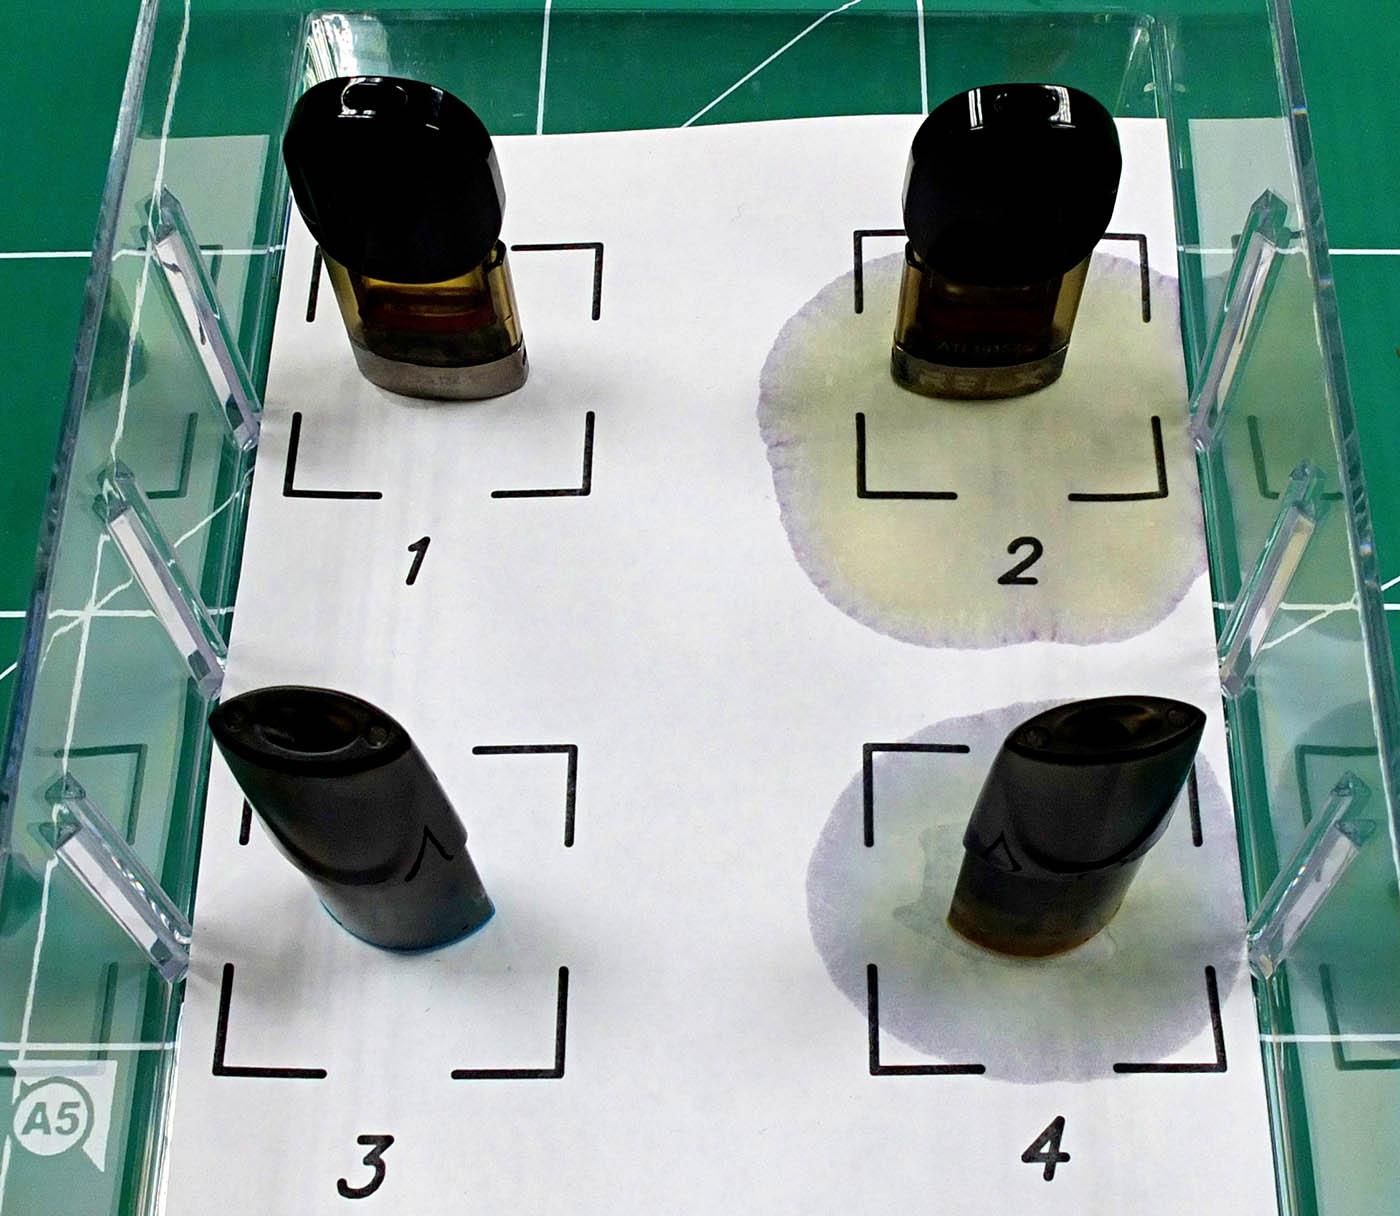 ecigarette pod cartridge leakage test